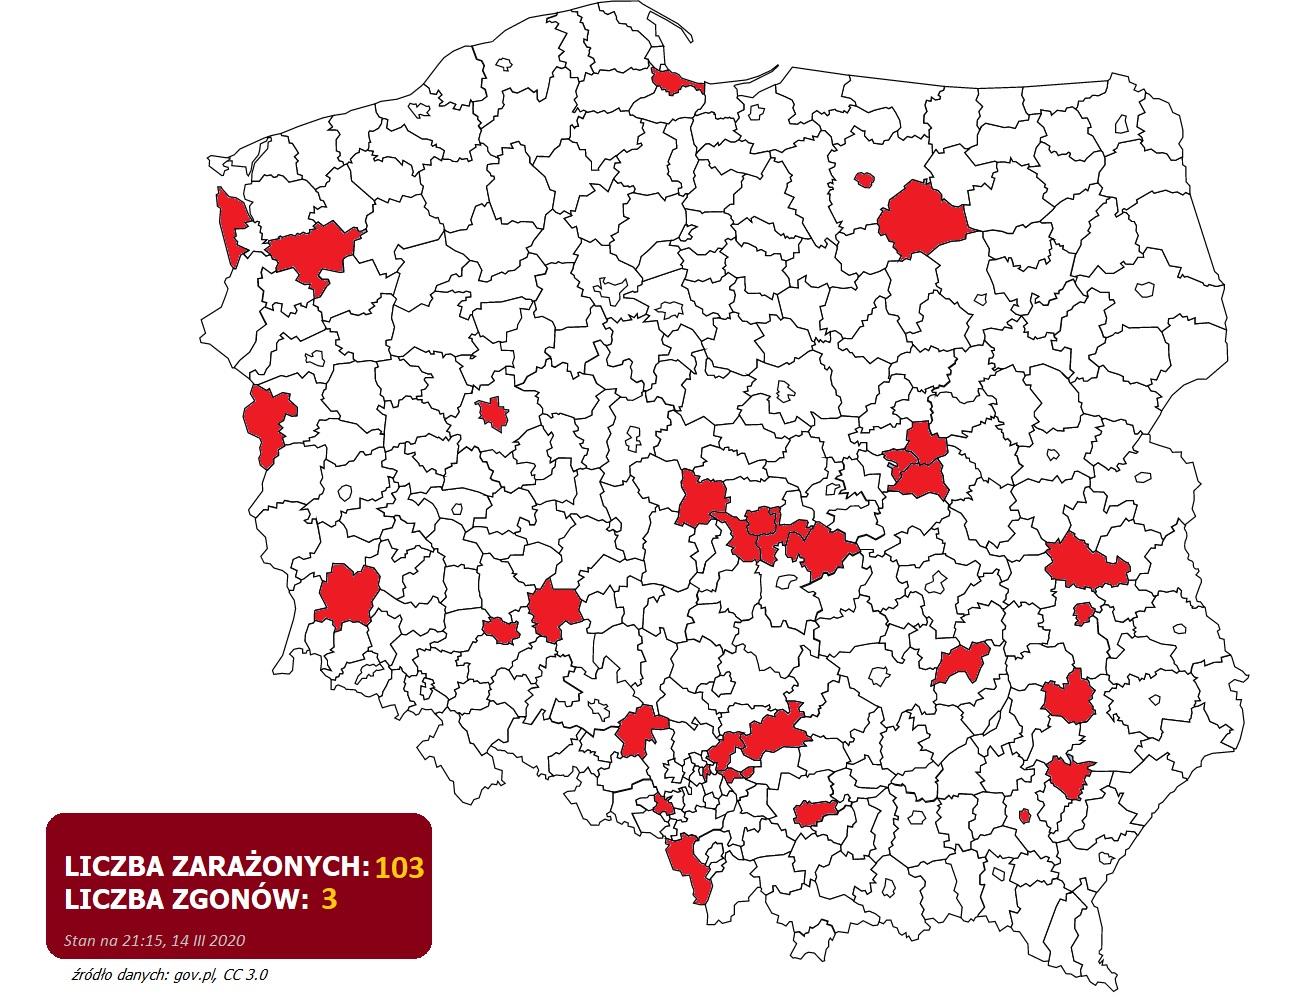 Koronawirus W Polsce 14 Iii 2020 Gazeta Olsztynska